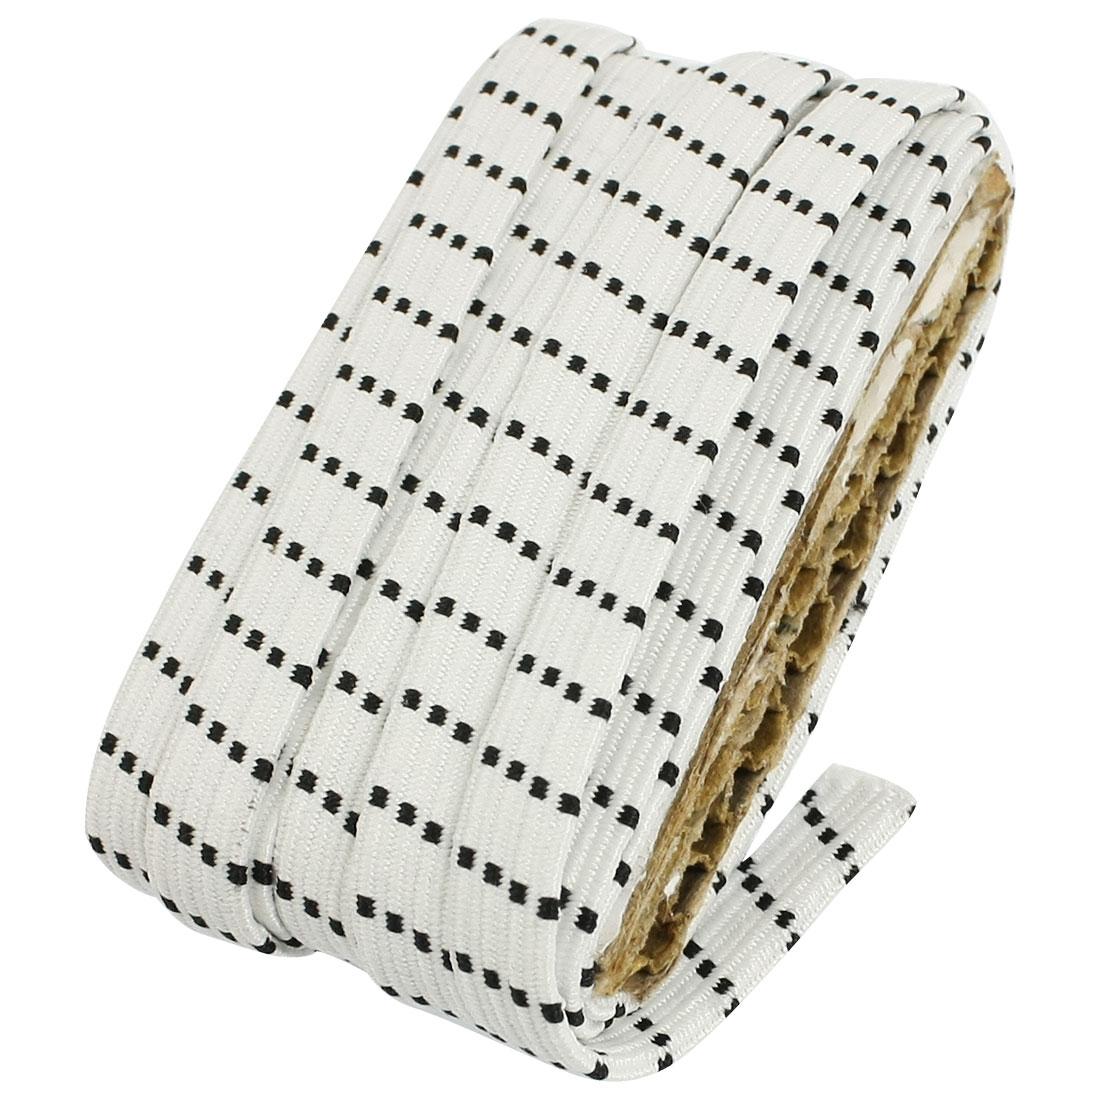 Ladies Tailor Textured Elastic Waist Belt Corset Band Black White